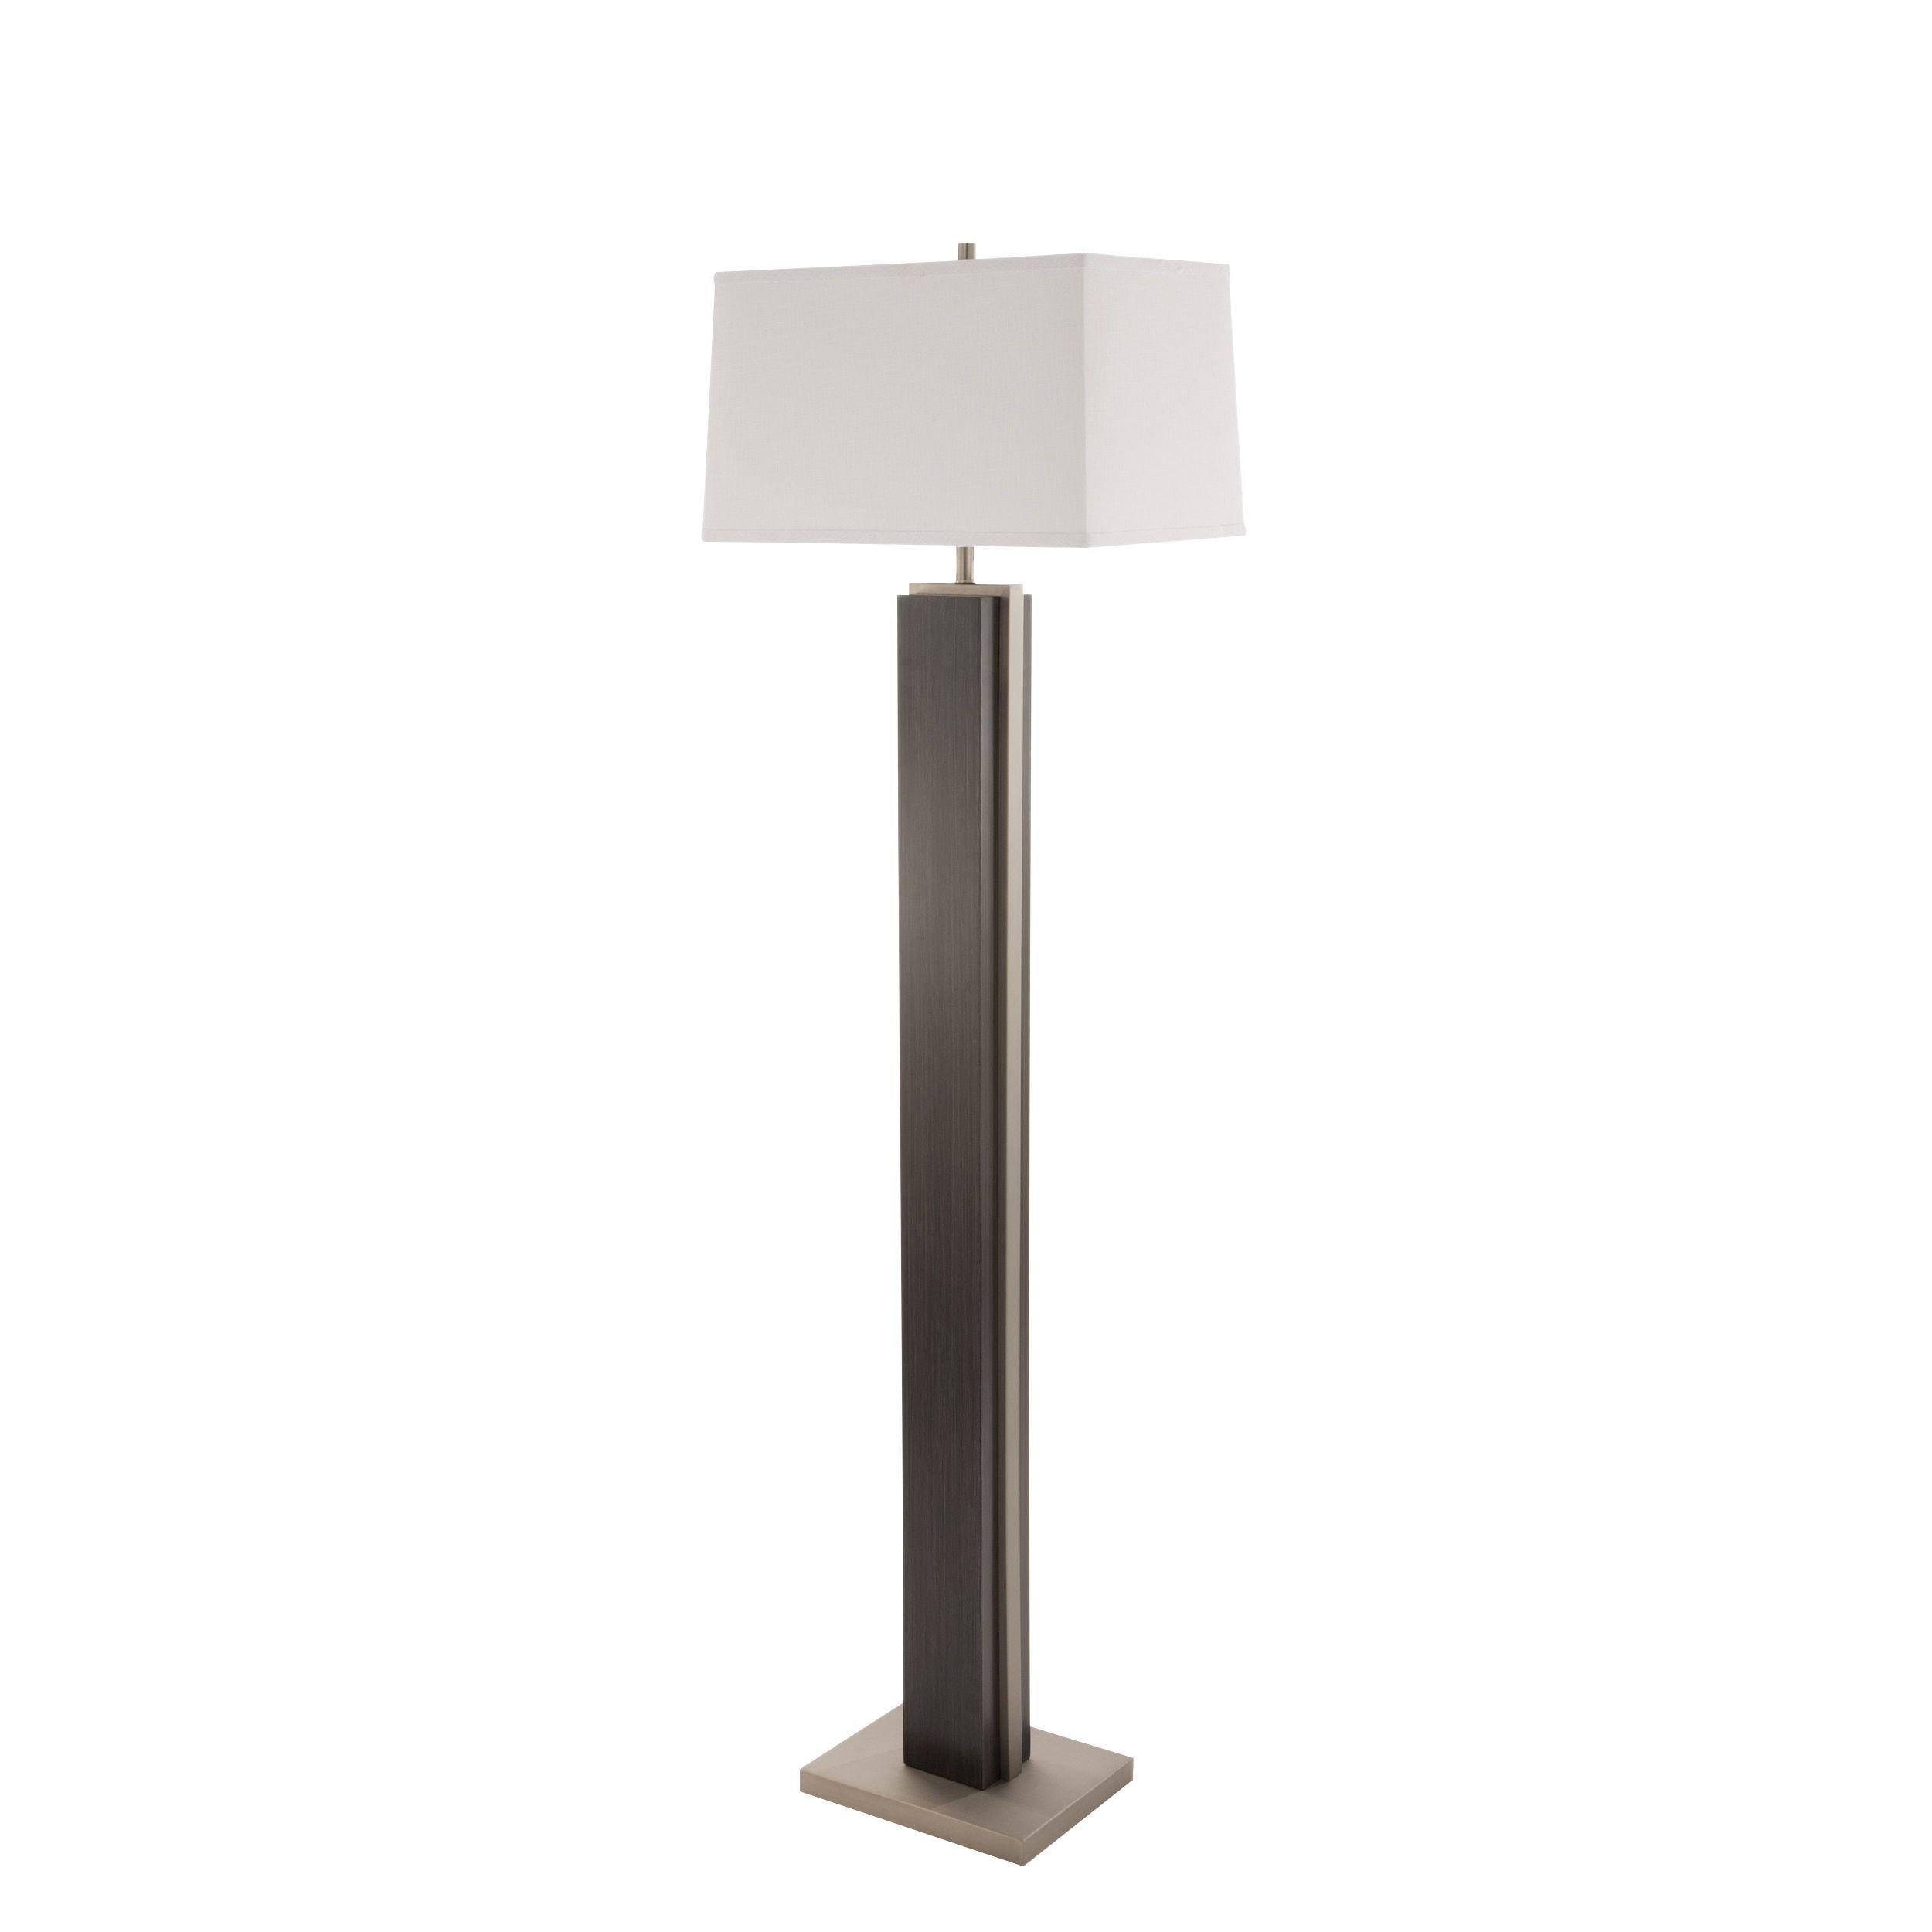 Nova Lighting Bounded Charcoal Grey Floor Lamp Gray Steel